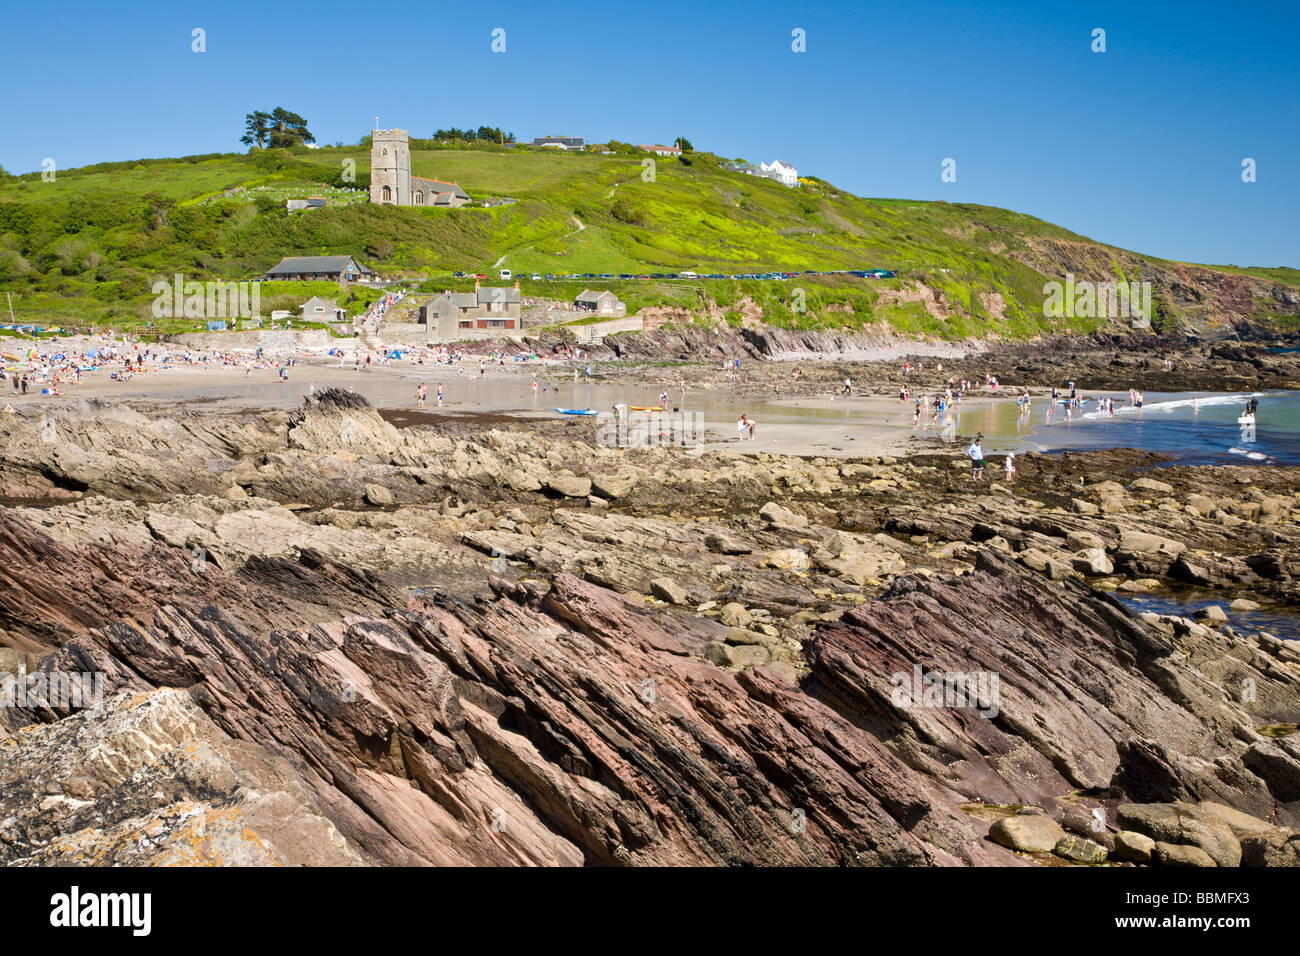 Rocky Coastline at Wembury Devon England UK Stock Photo